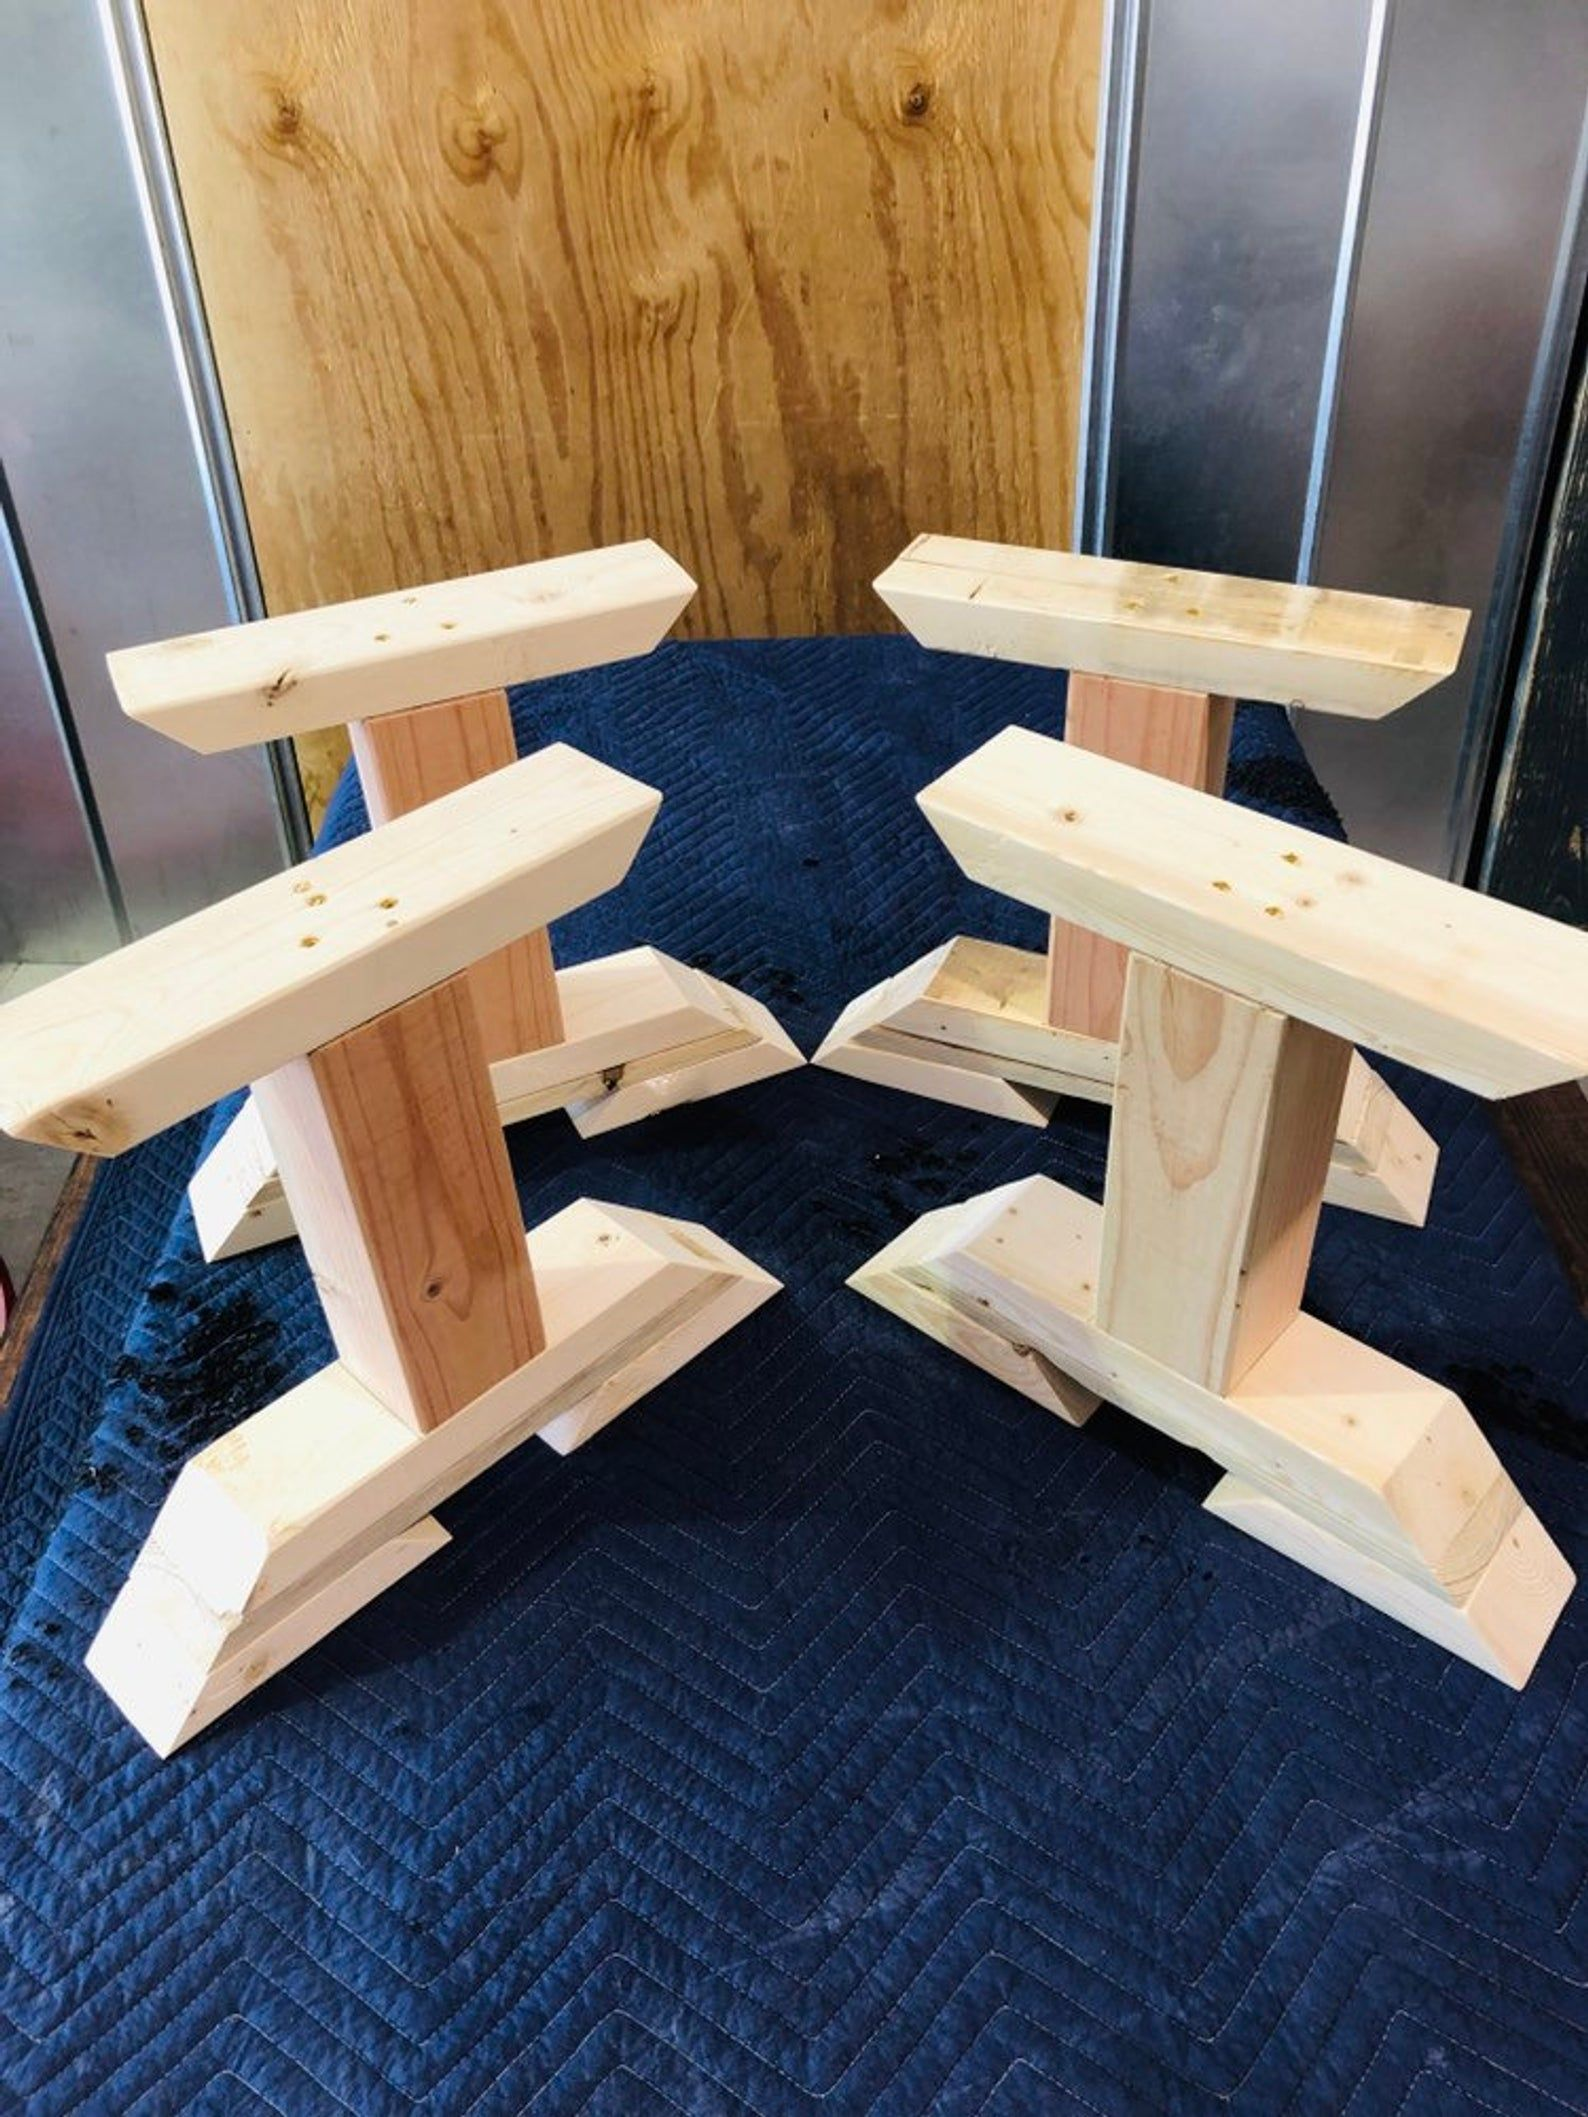 Diy Bench Leg Set Trestle Style Wooden Bench Legs Handmade Pedestal Legs Diy Coffee Table End Ta Diy Table Legs Diy Coffee Table Diy Bench [ 2117 x 1588 Pixel ]